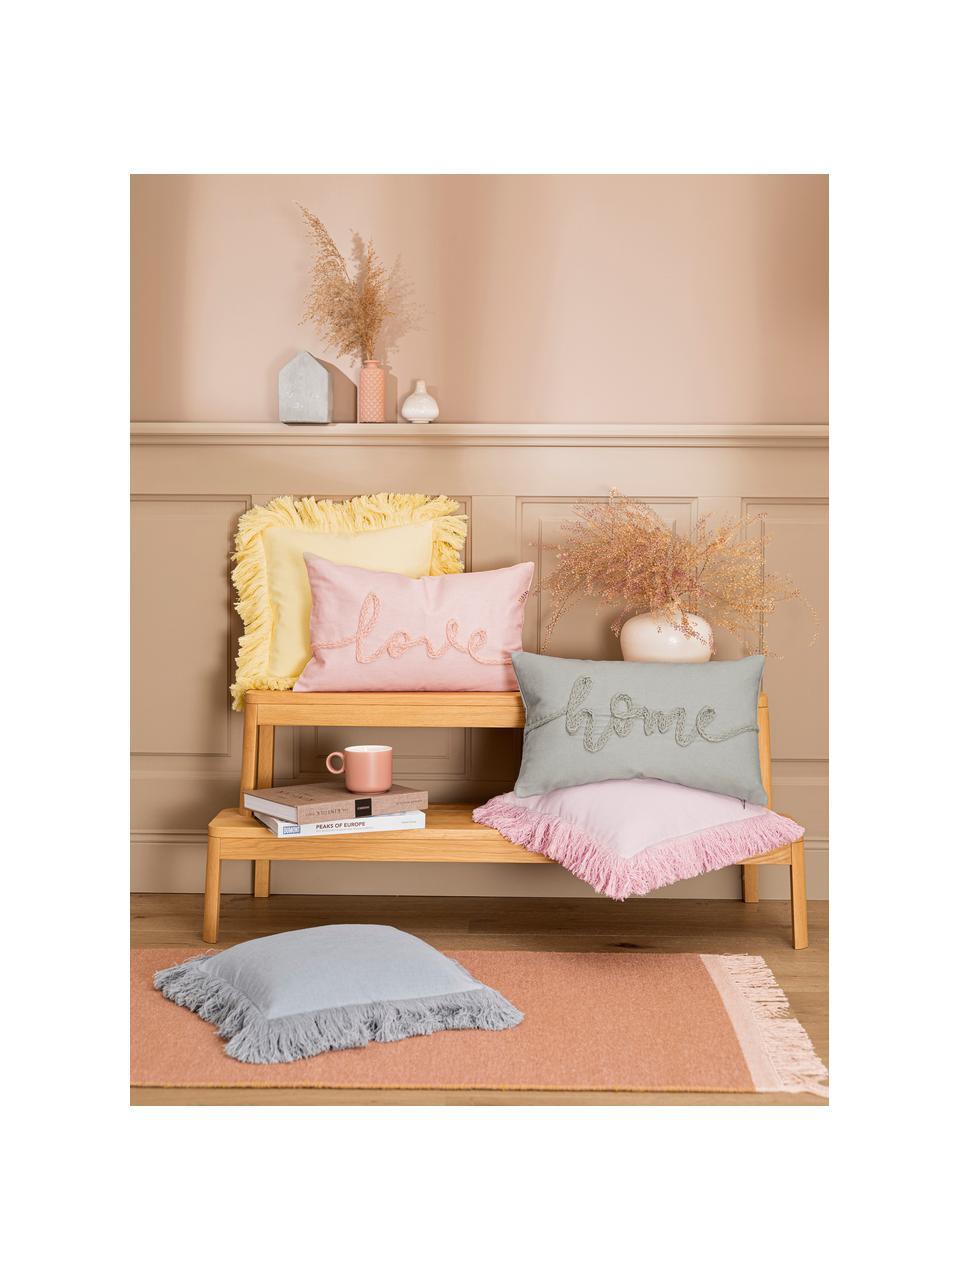 Kissenhülle Mina mit gestickter Aufschrift, 70% Polyester, 30% Baumwolle, Grau, 30 x 50 cm